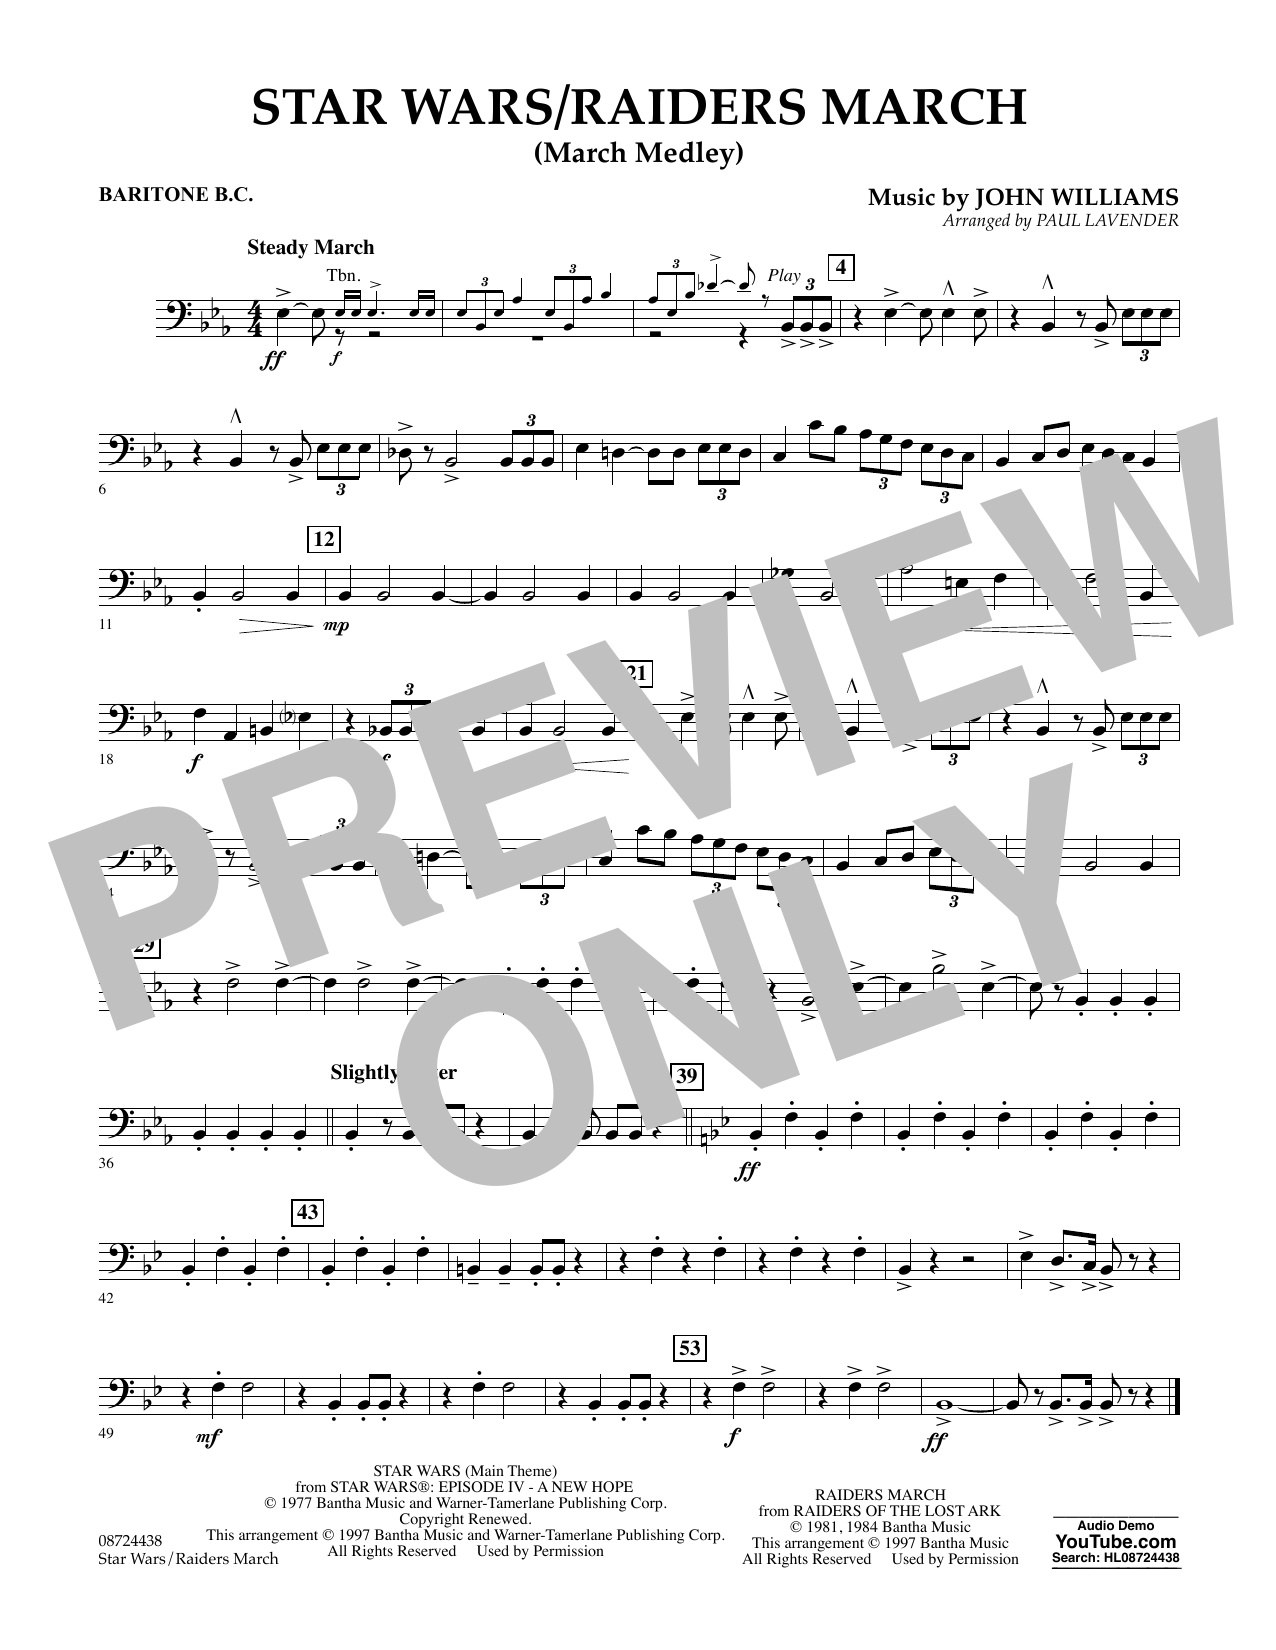 Star Wars/Raiders March - Baritone B.C. (Concert Band)